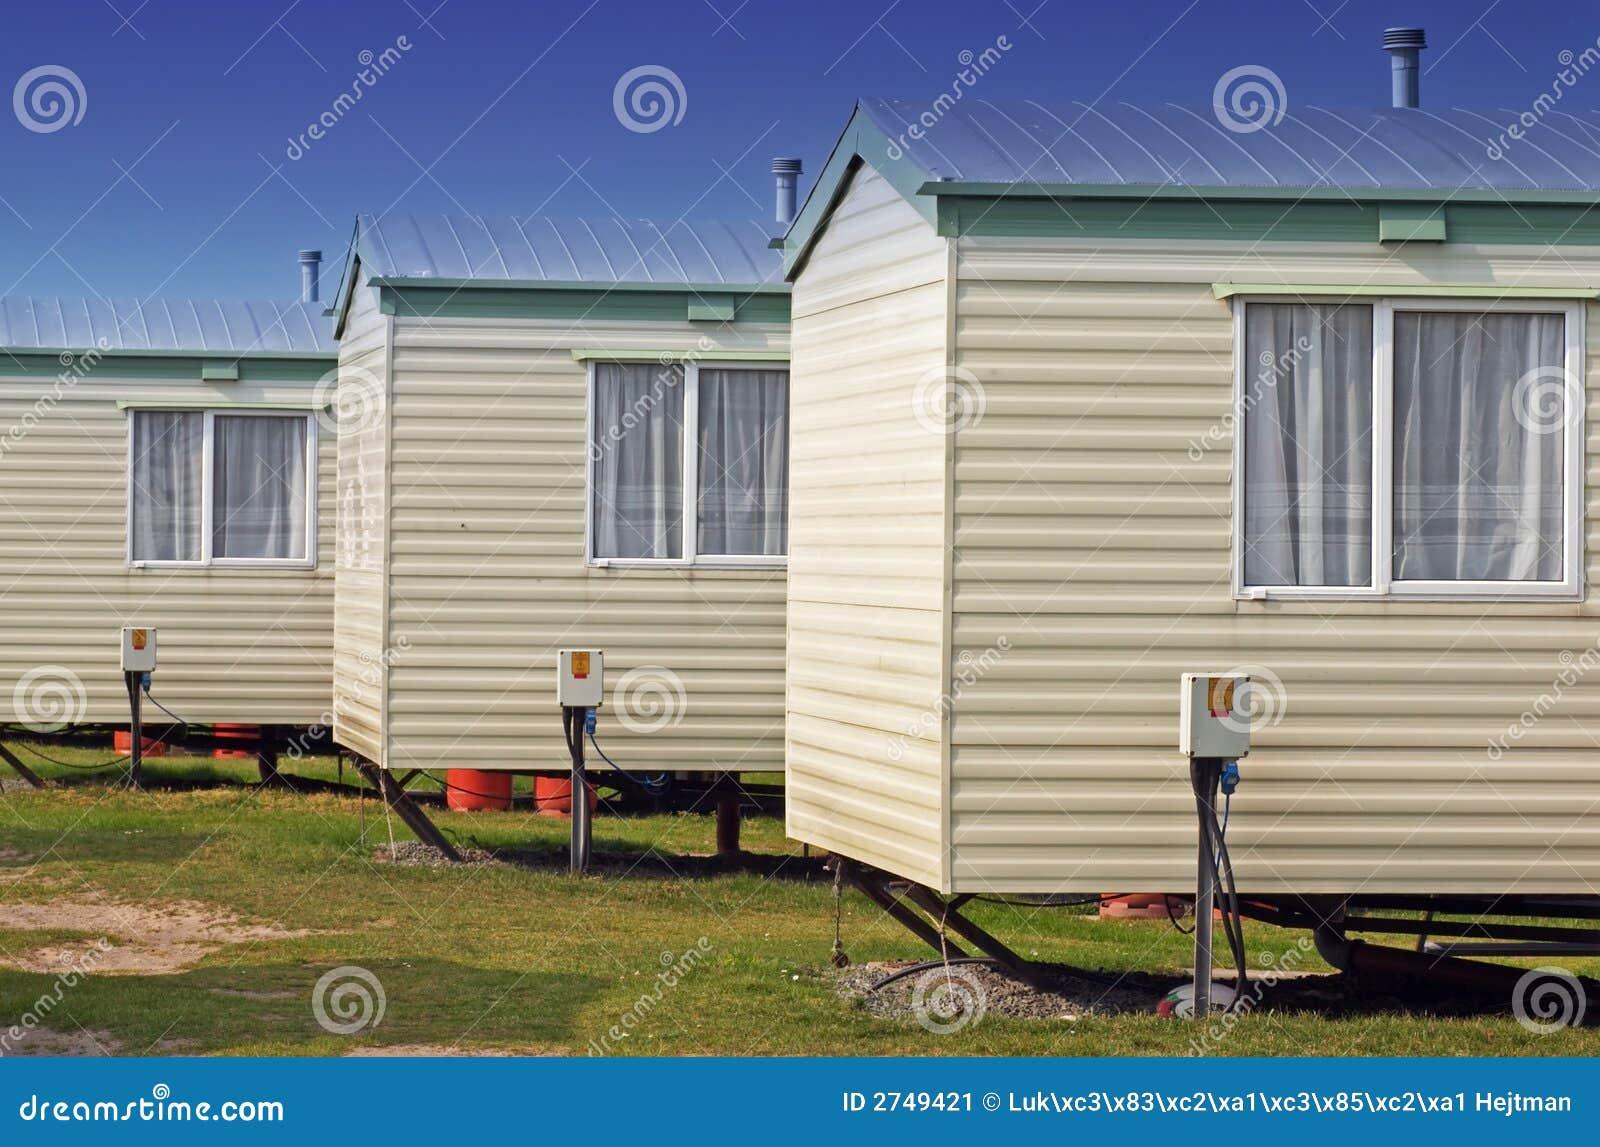 Trailer Homes Stock Image - Image: 2749421